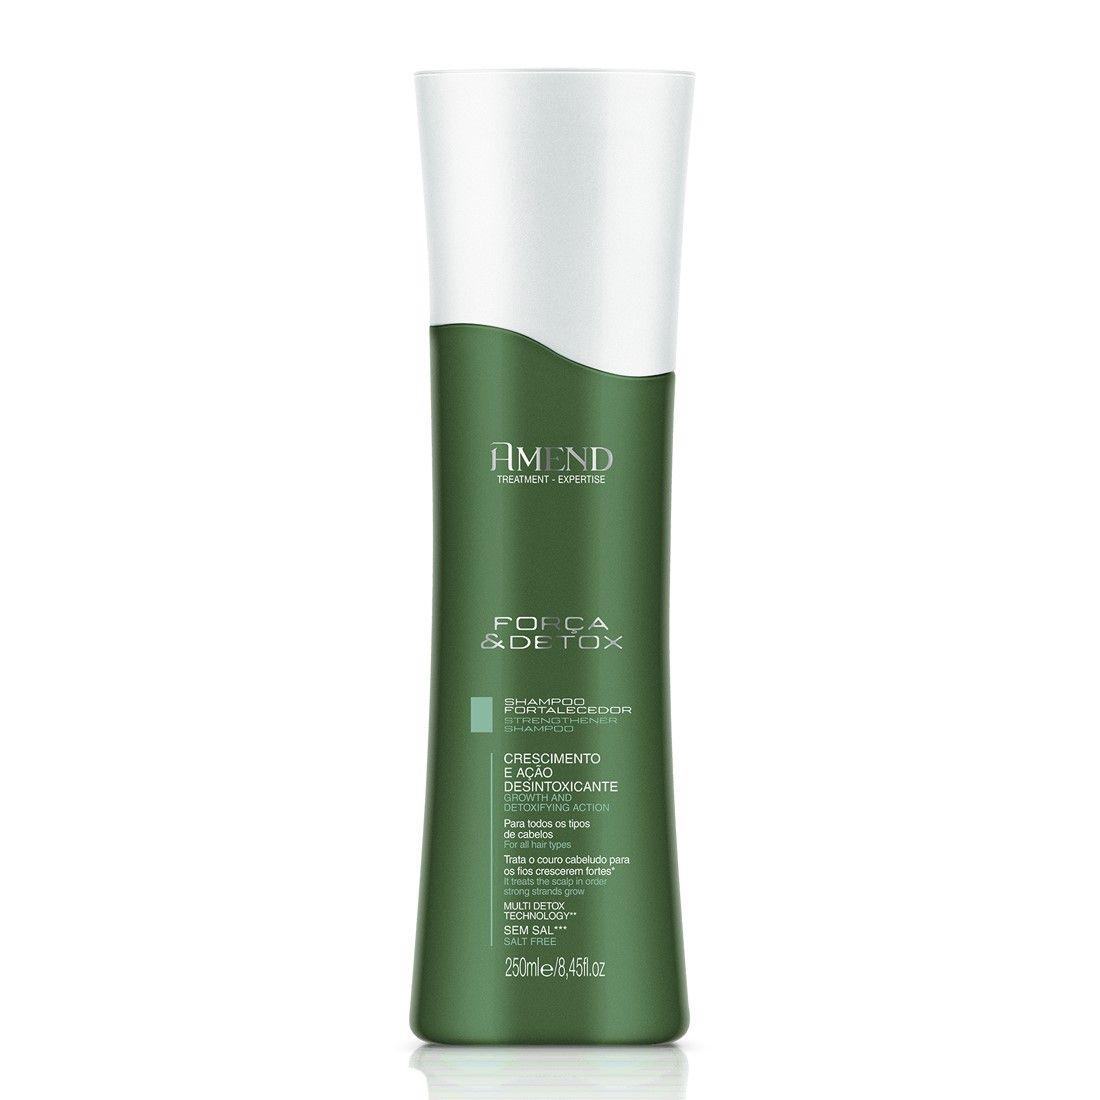 Shampoo Fortalecedor Força & Detox Amend - 250ml